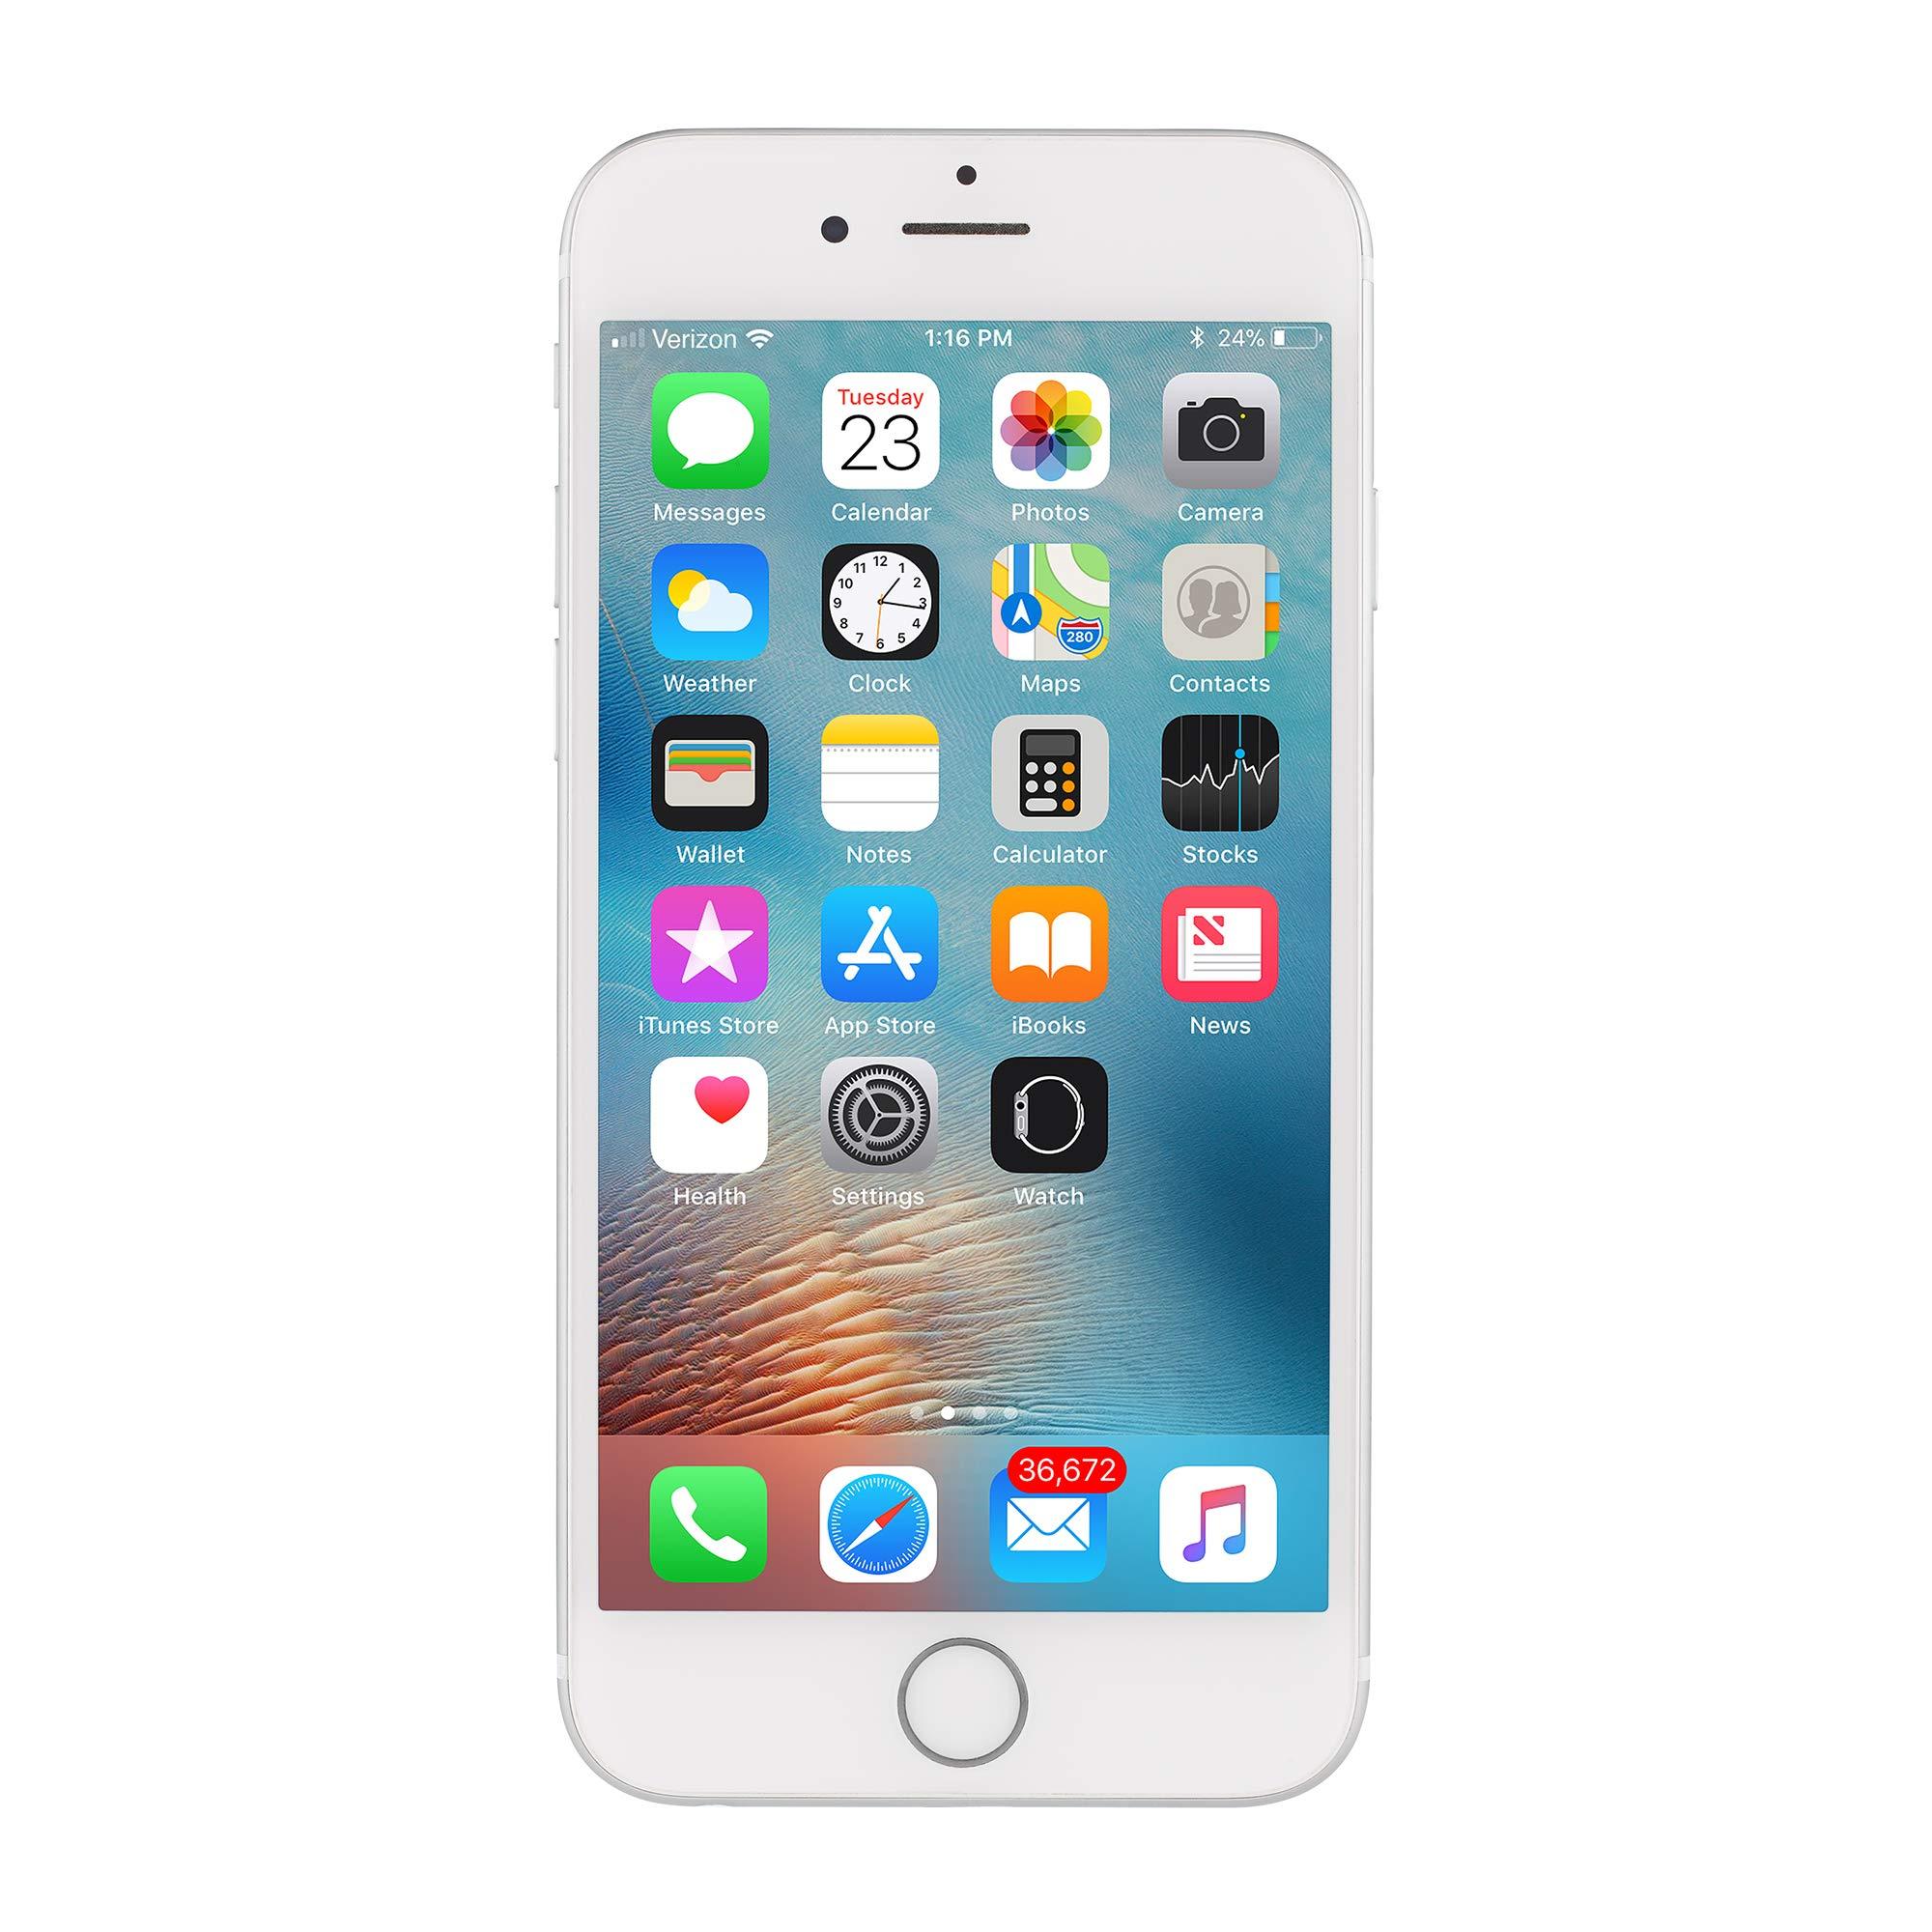 Apple iPhone 7 a1778 128GB Smartphone at&T Unlocked (Renewed)